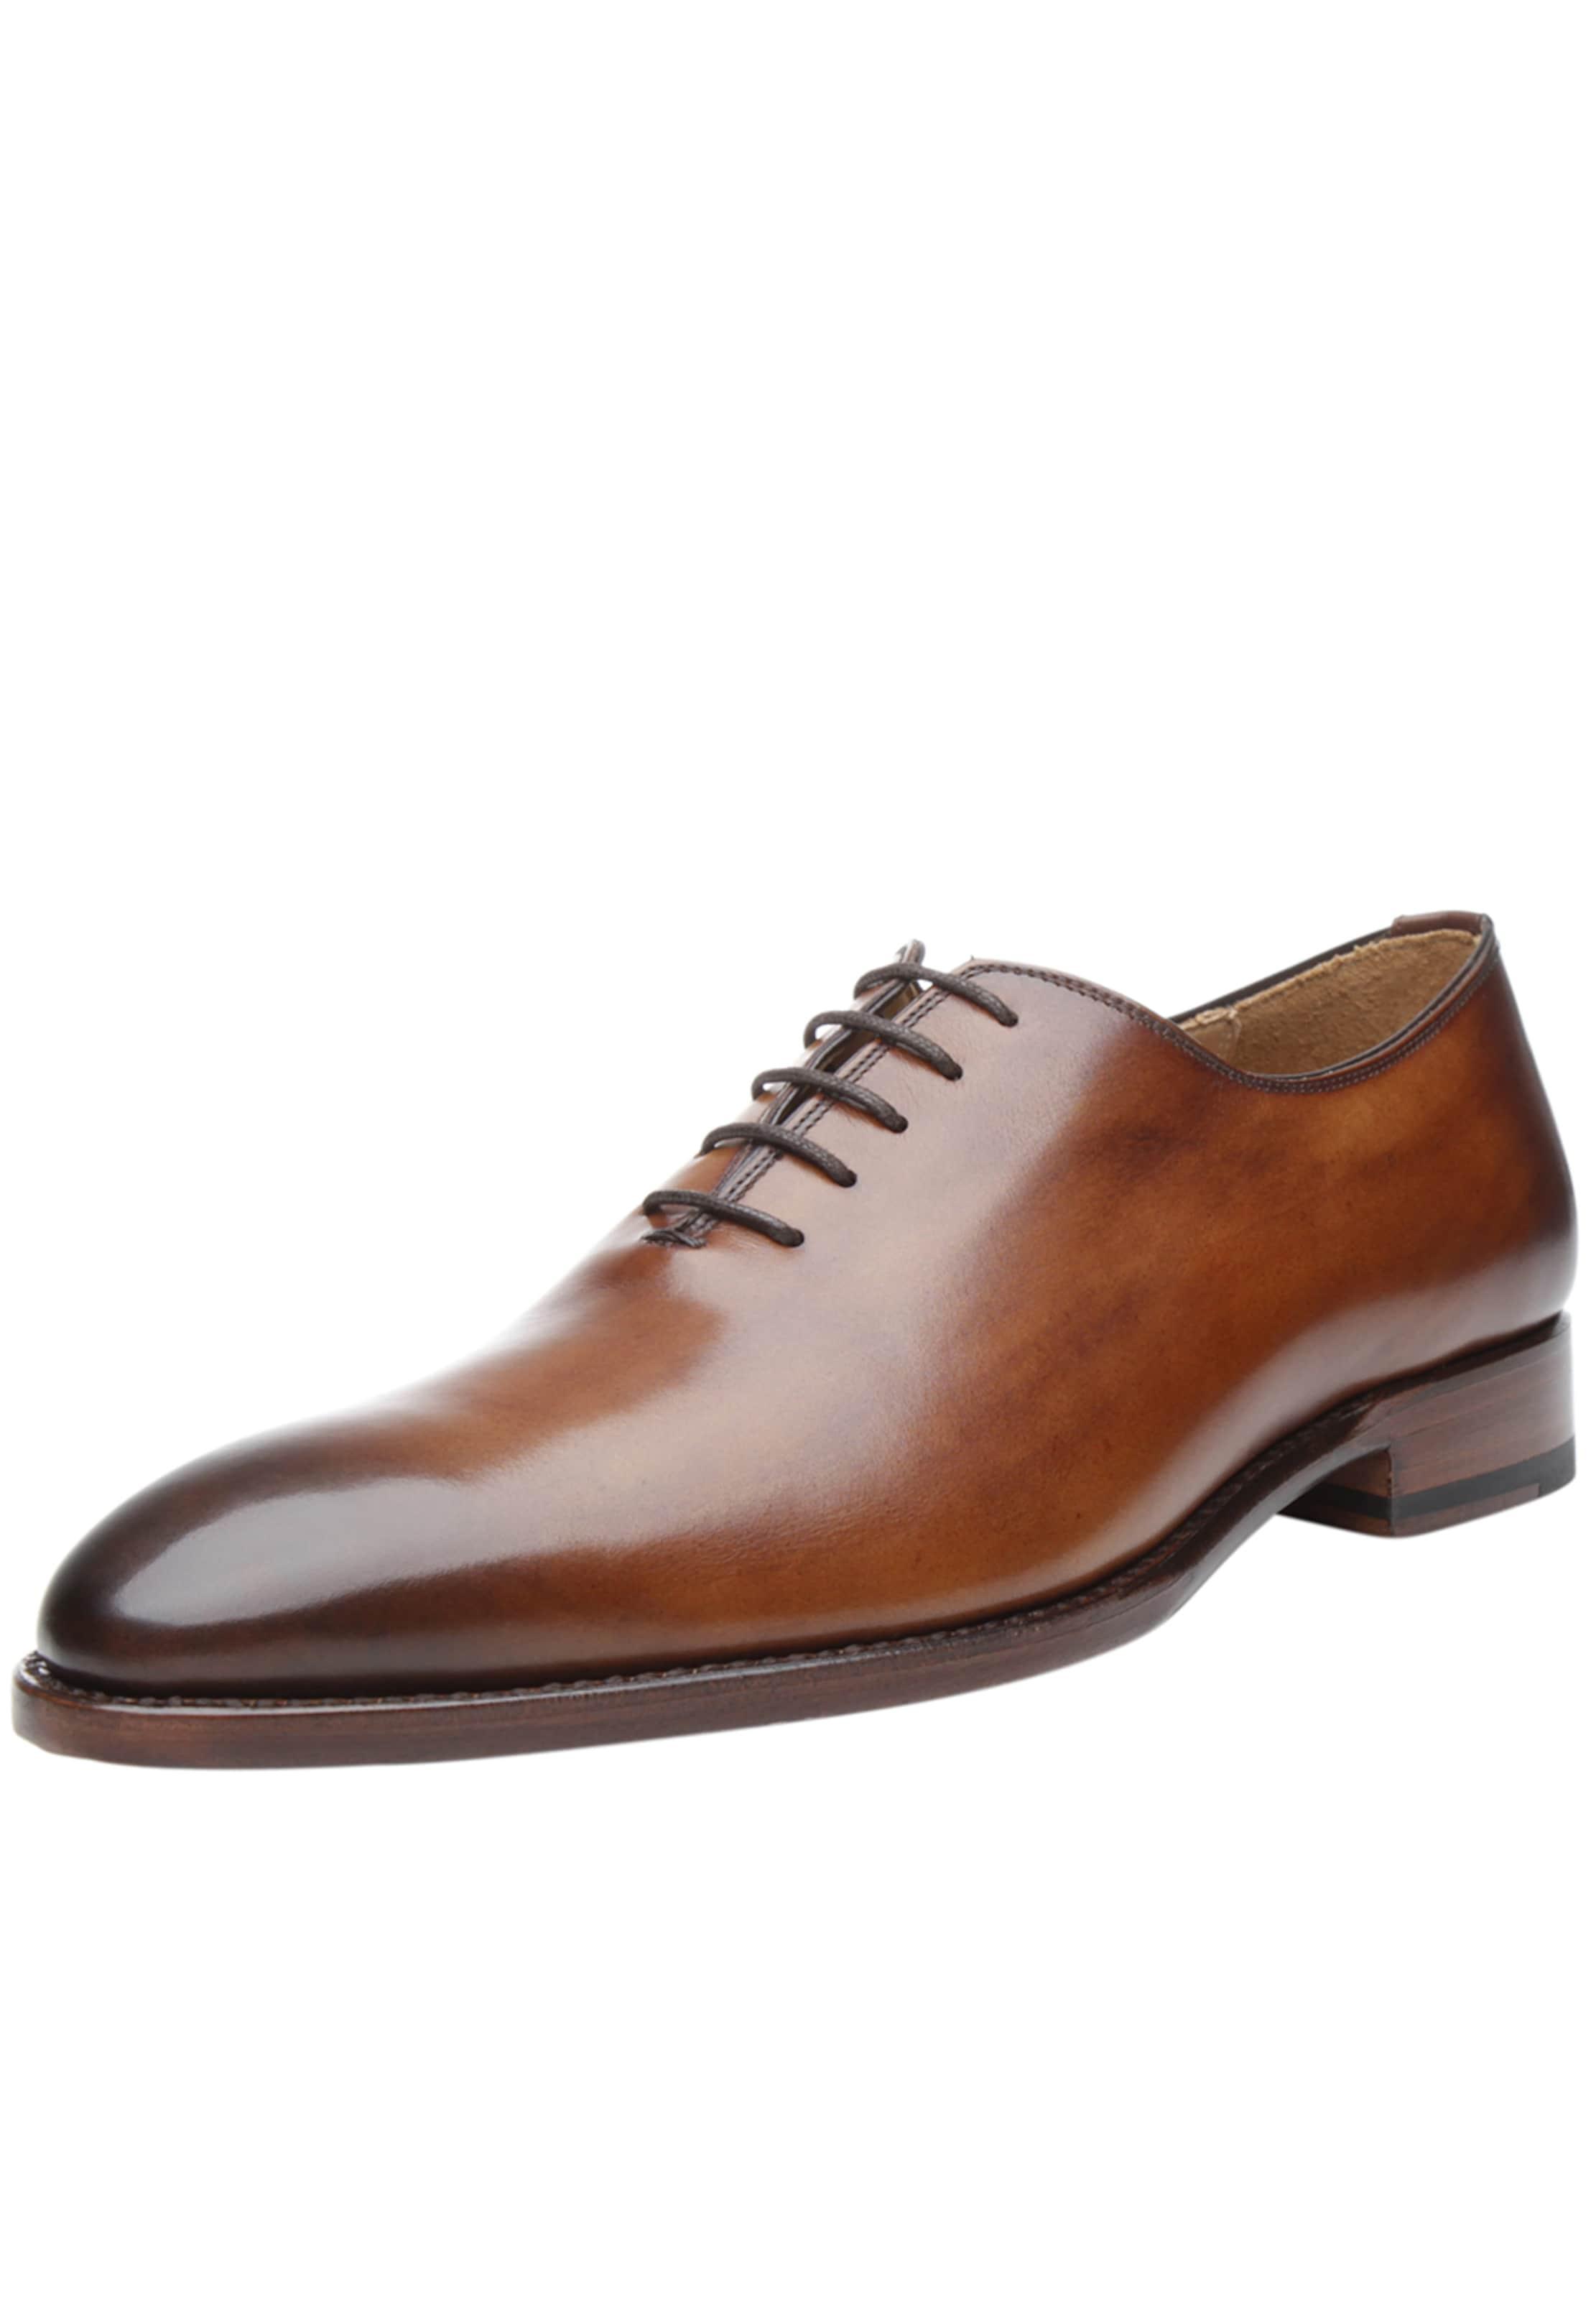 SHOEPASSION Halbschuhe No. 5251 Verschleißfeste billige Schuhe